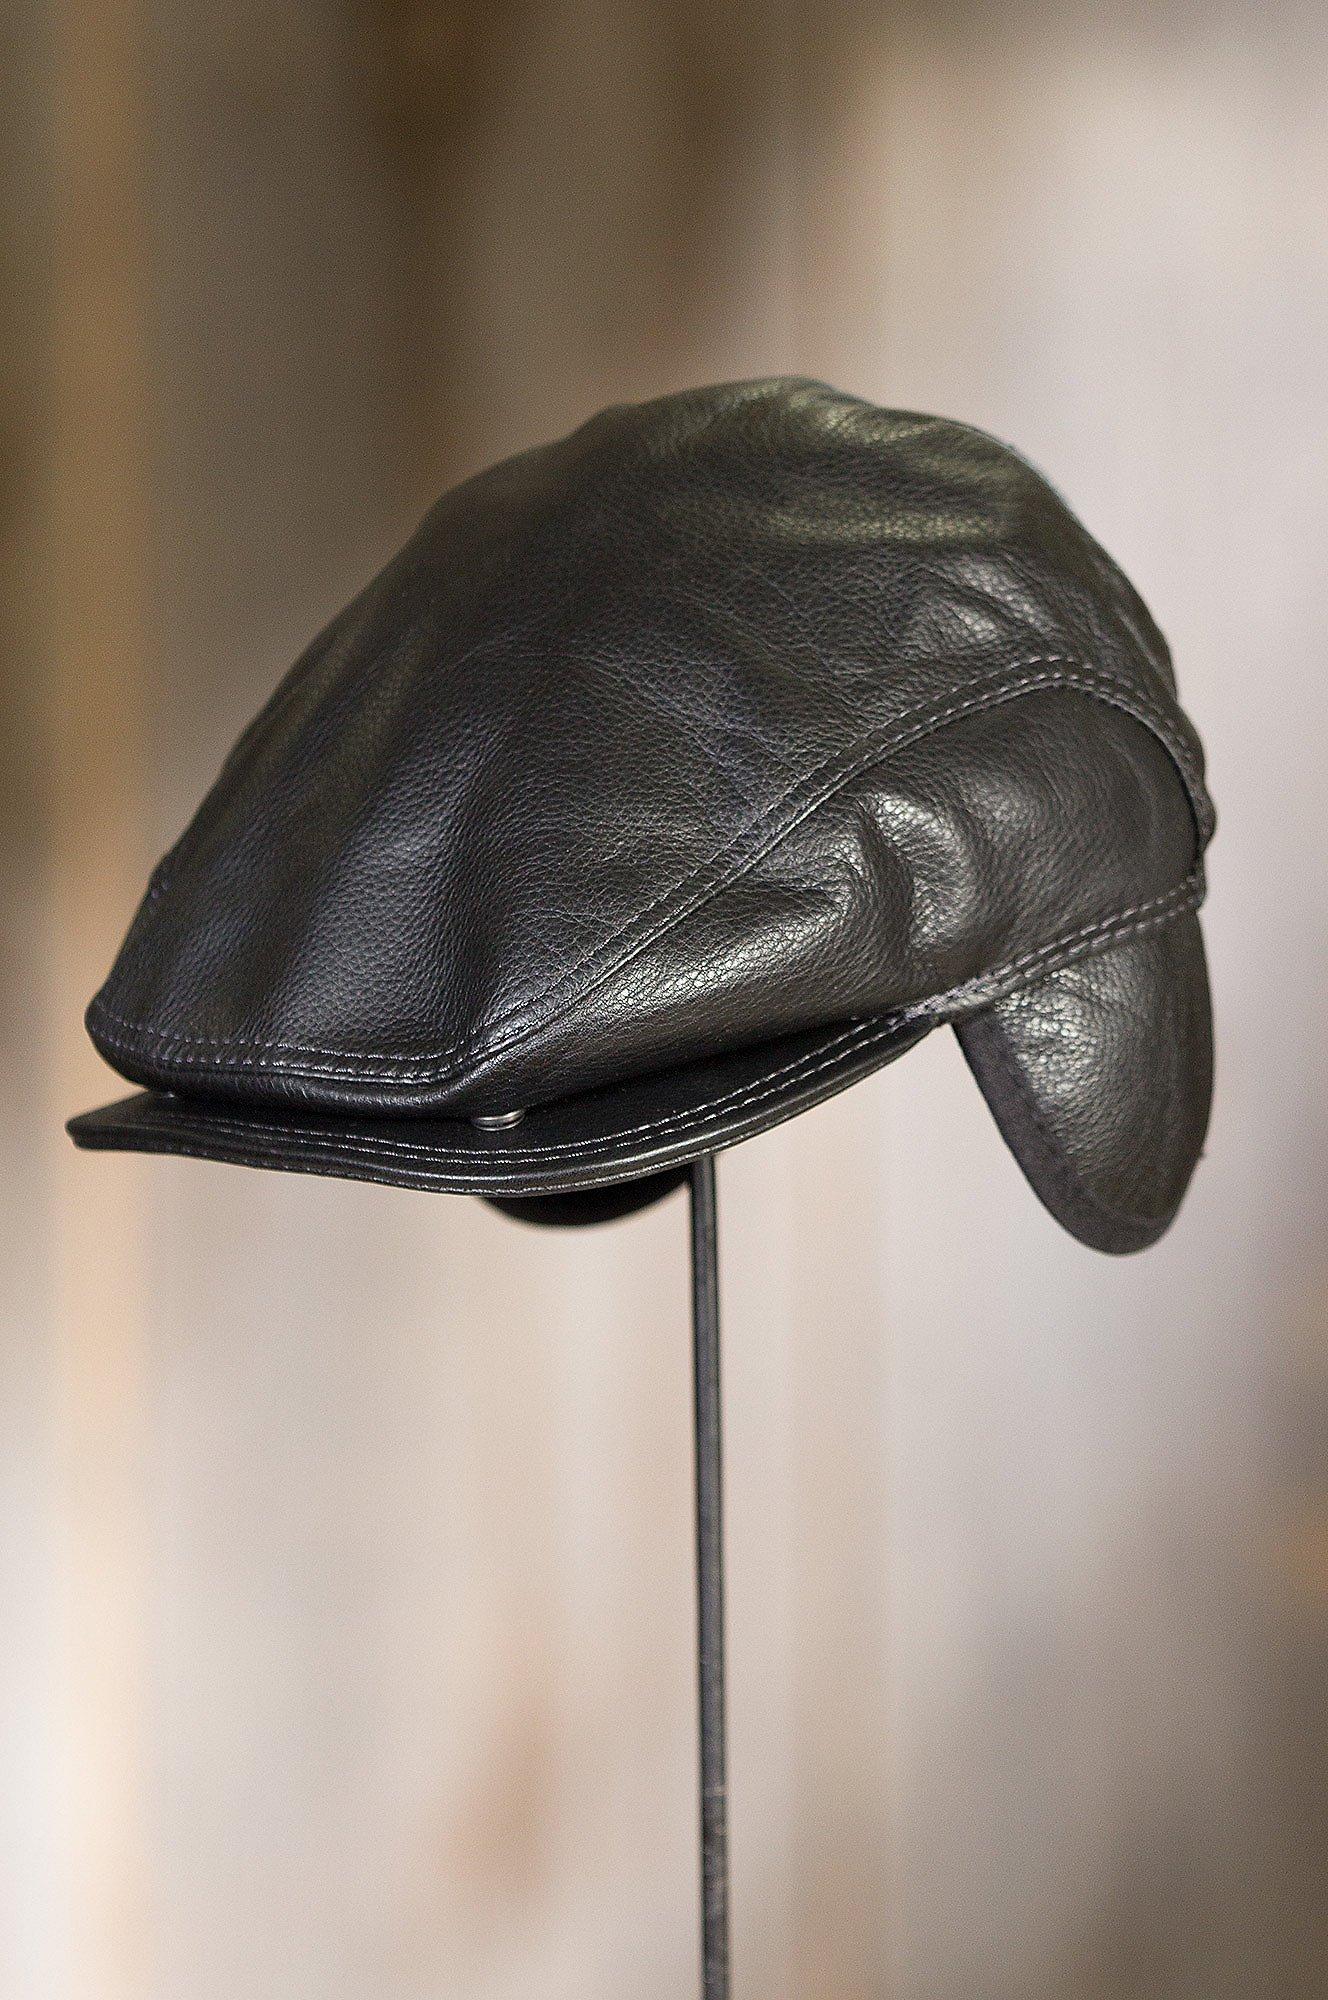 Overland Sheepskin Co. Allen Leather IVY Cap, Black, Size Large (7 1/4-7 3/8) by Overland Sheepskin Co (Image #3)